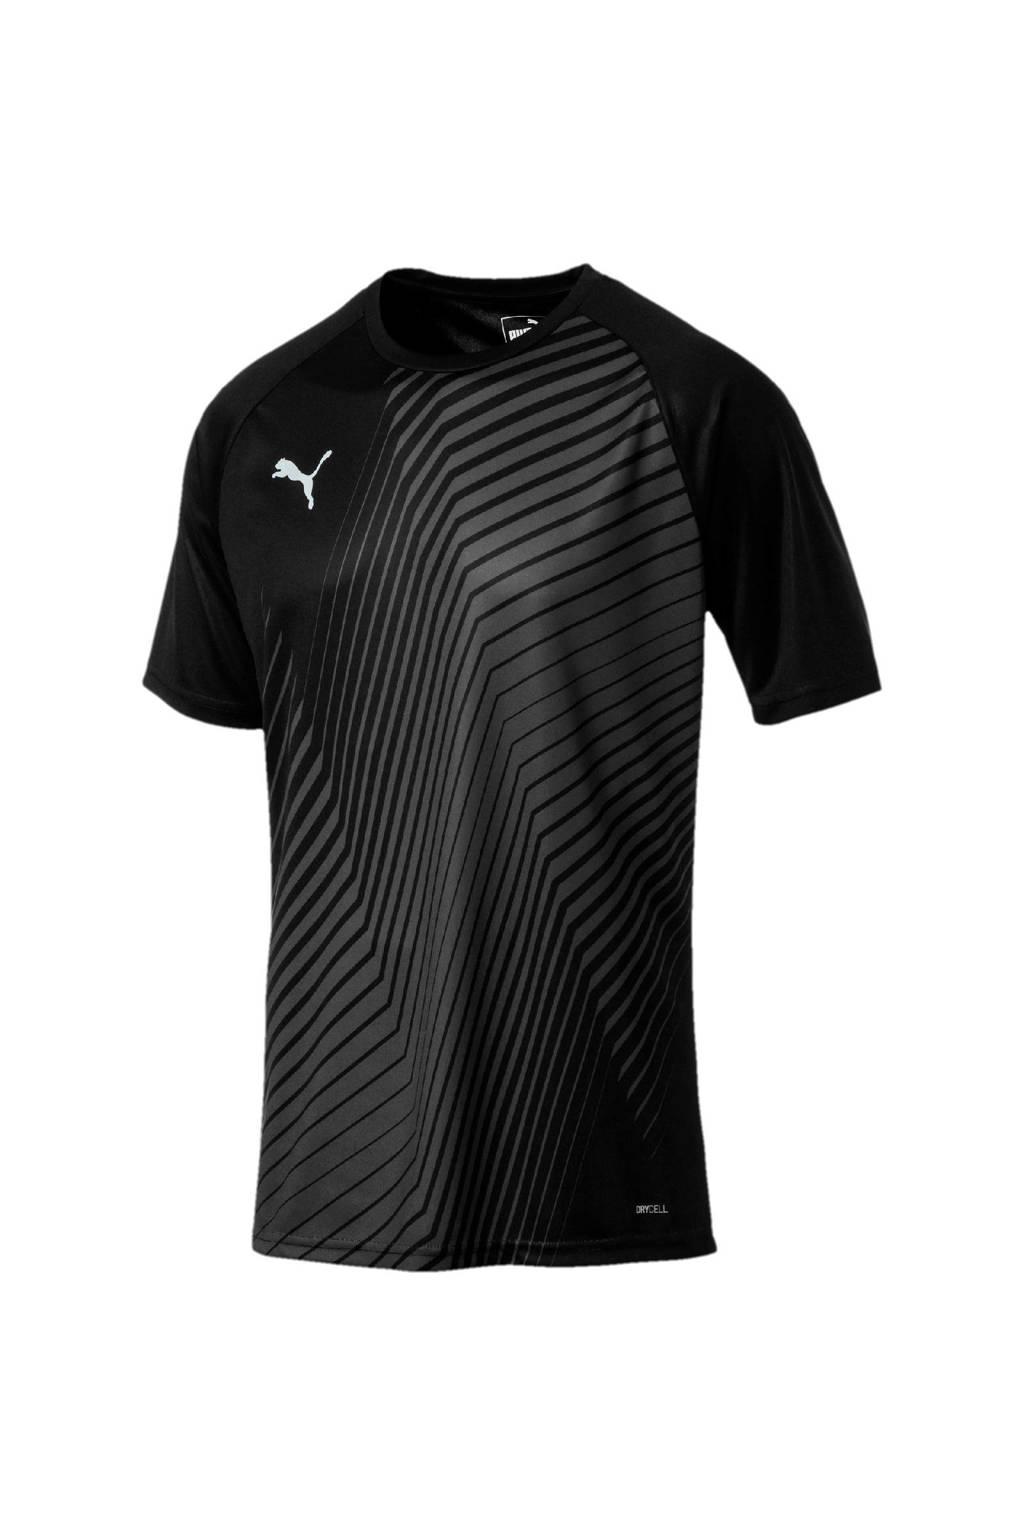 Puma   voetbalshirt zwart, Zwart